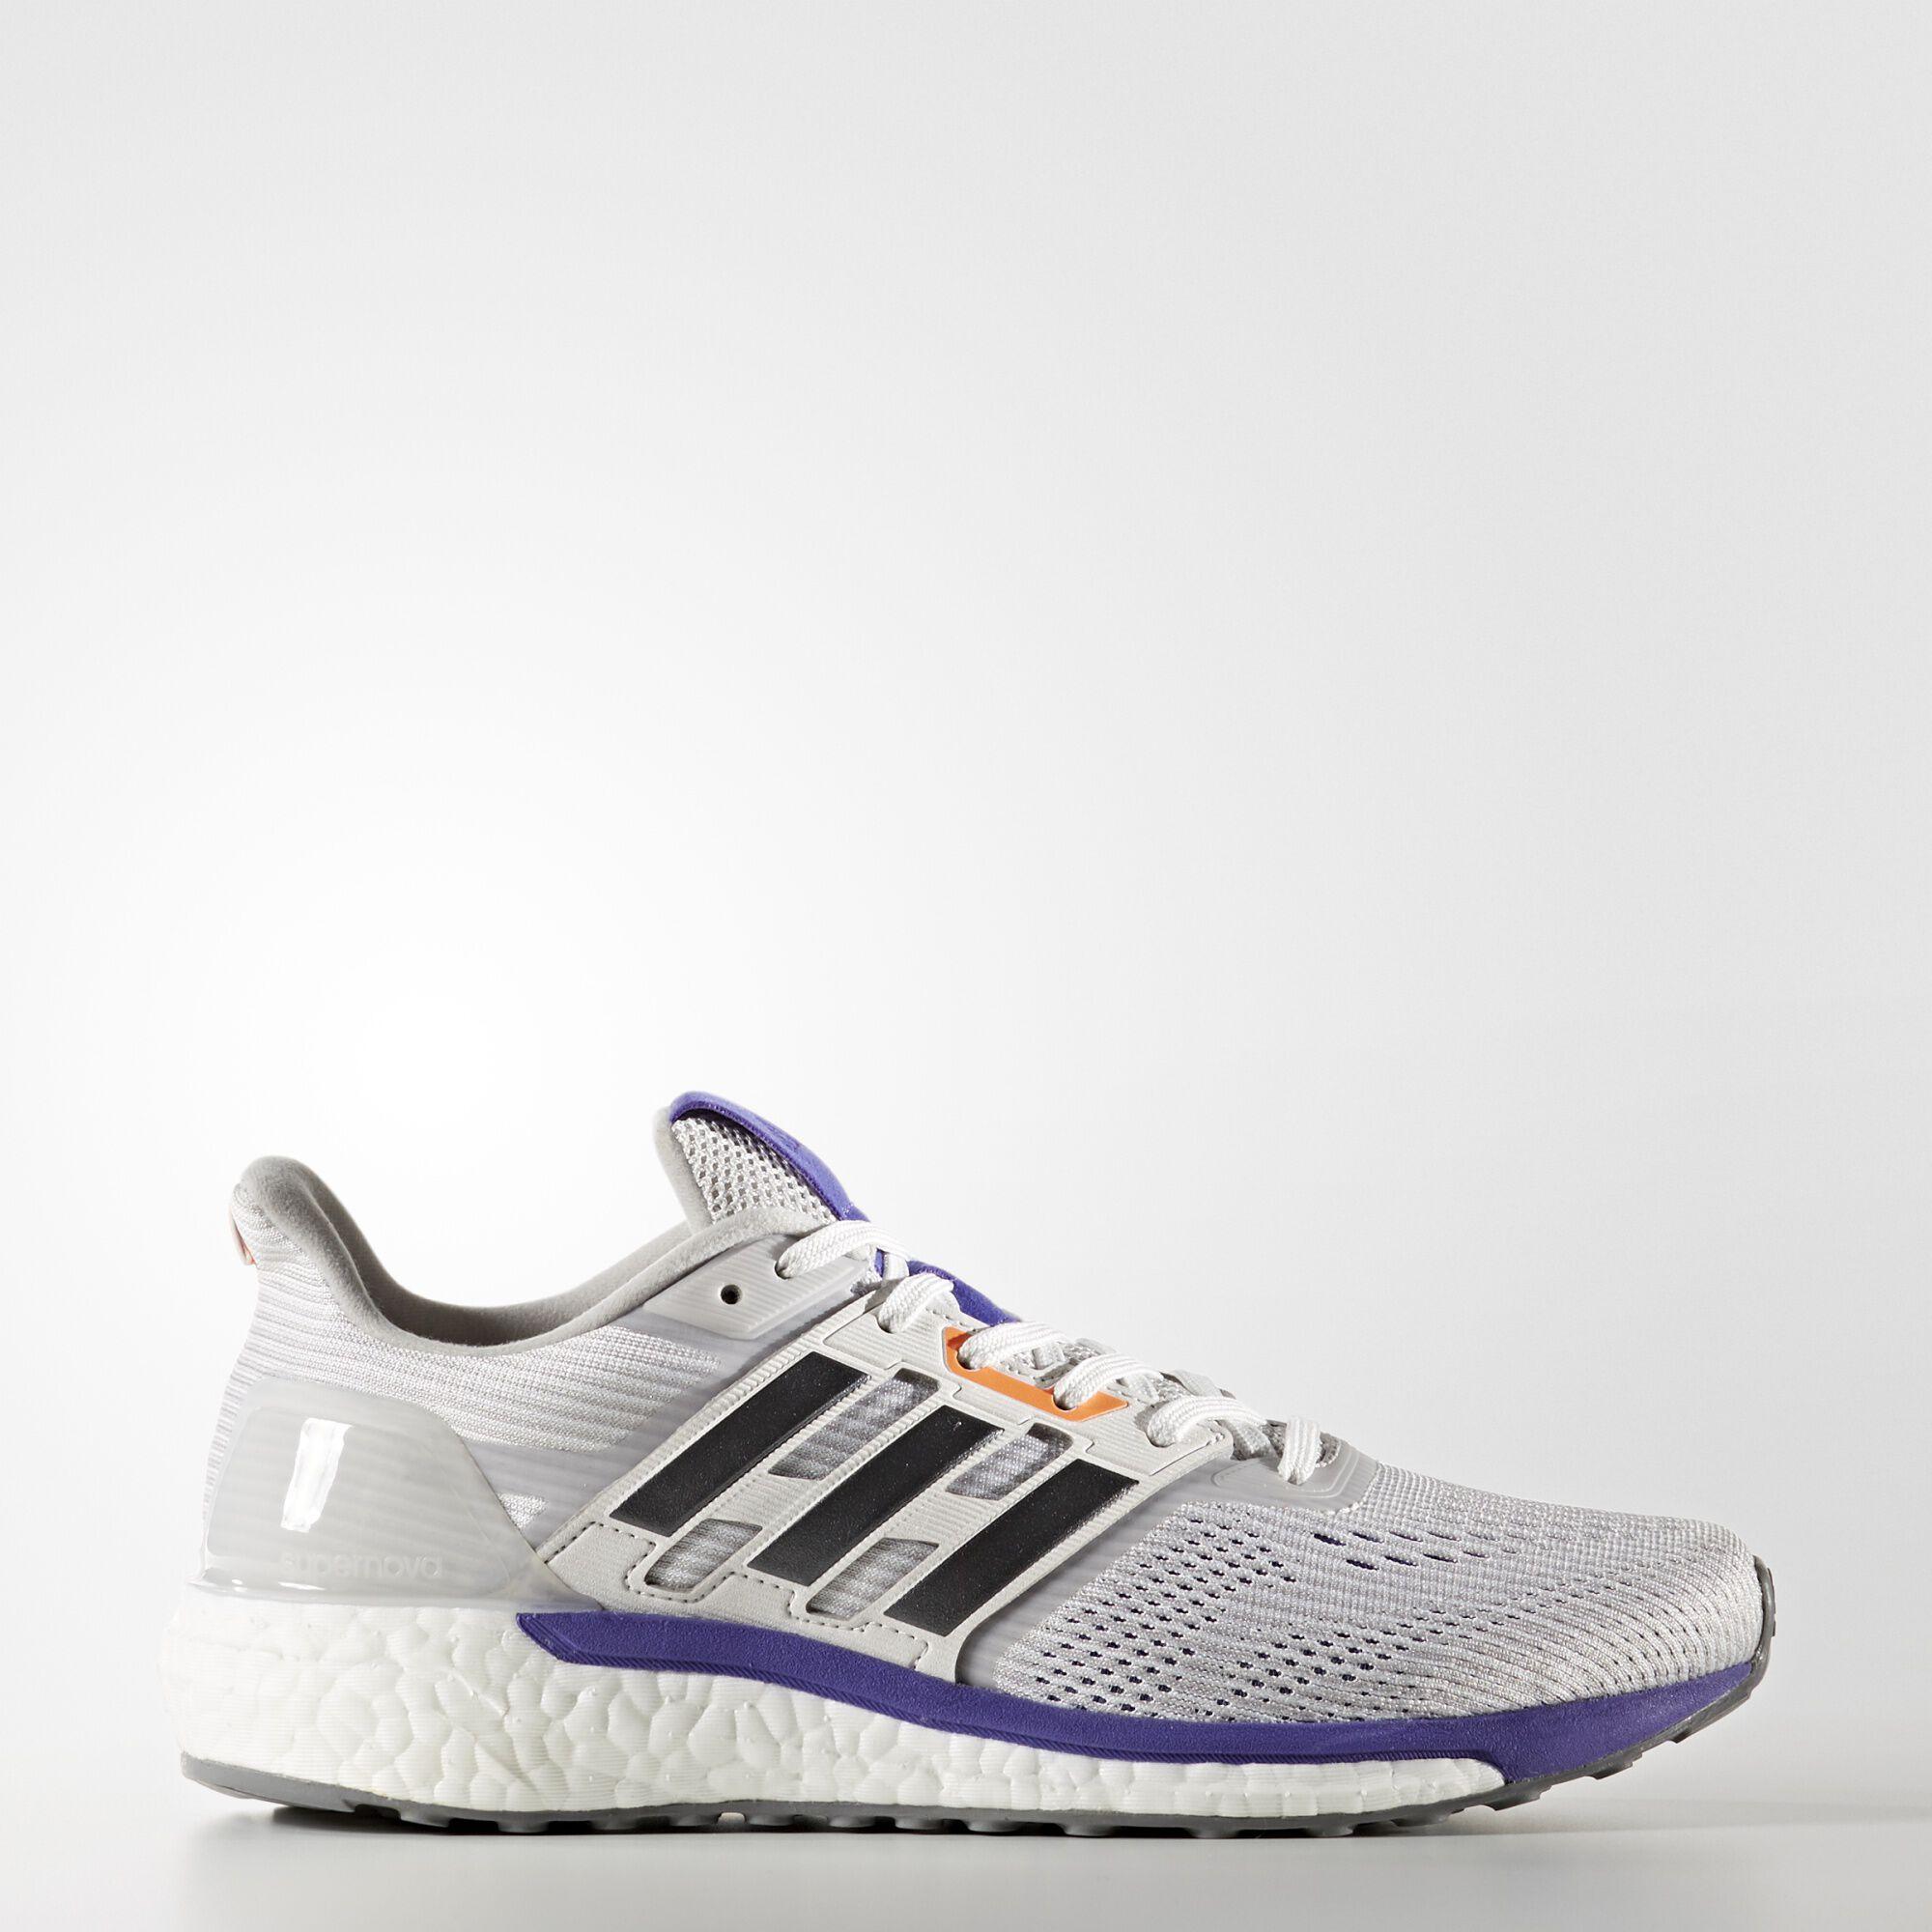 adidas energy boost 11.5